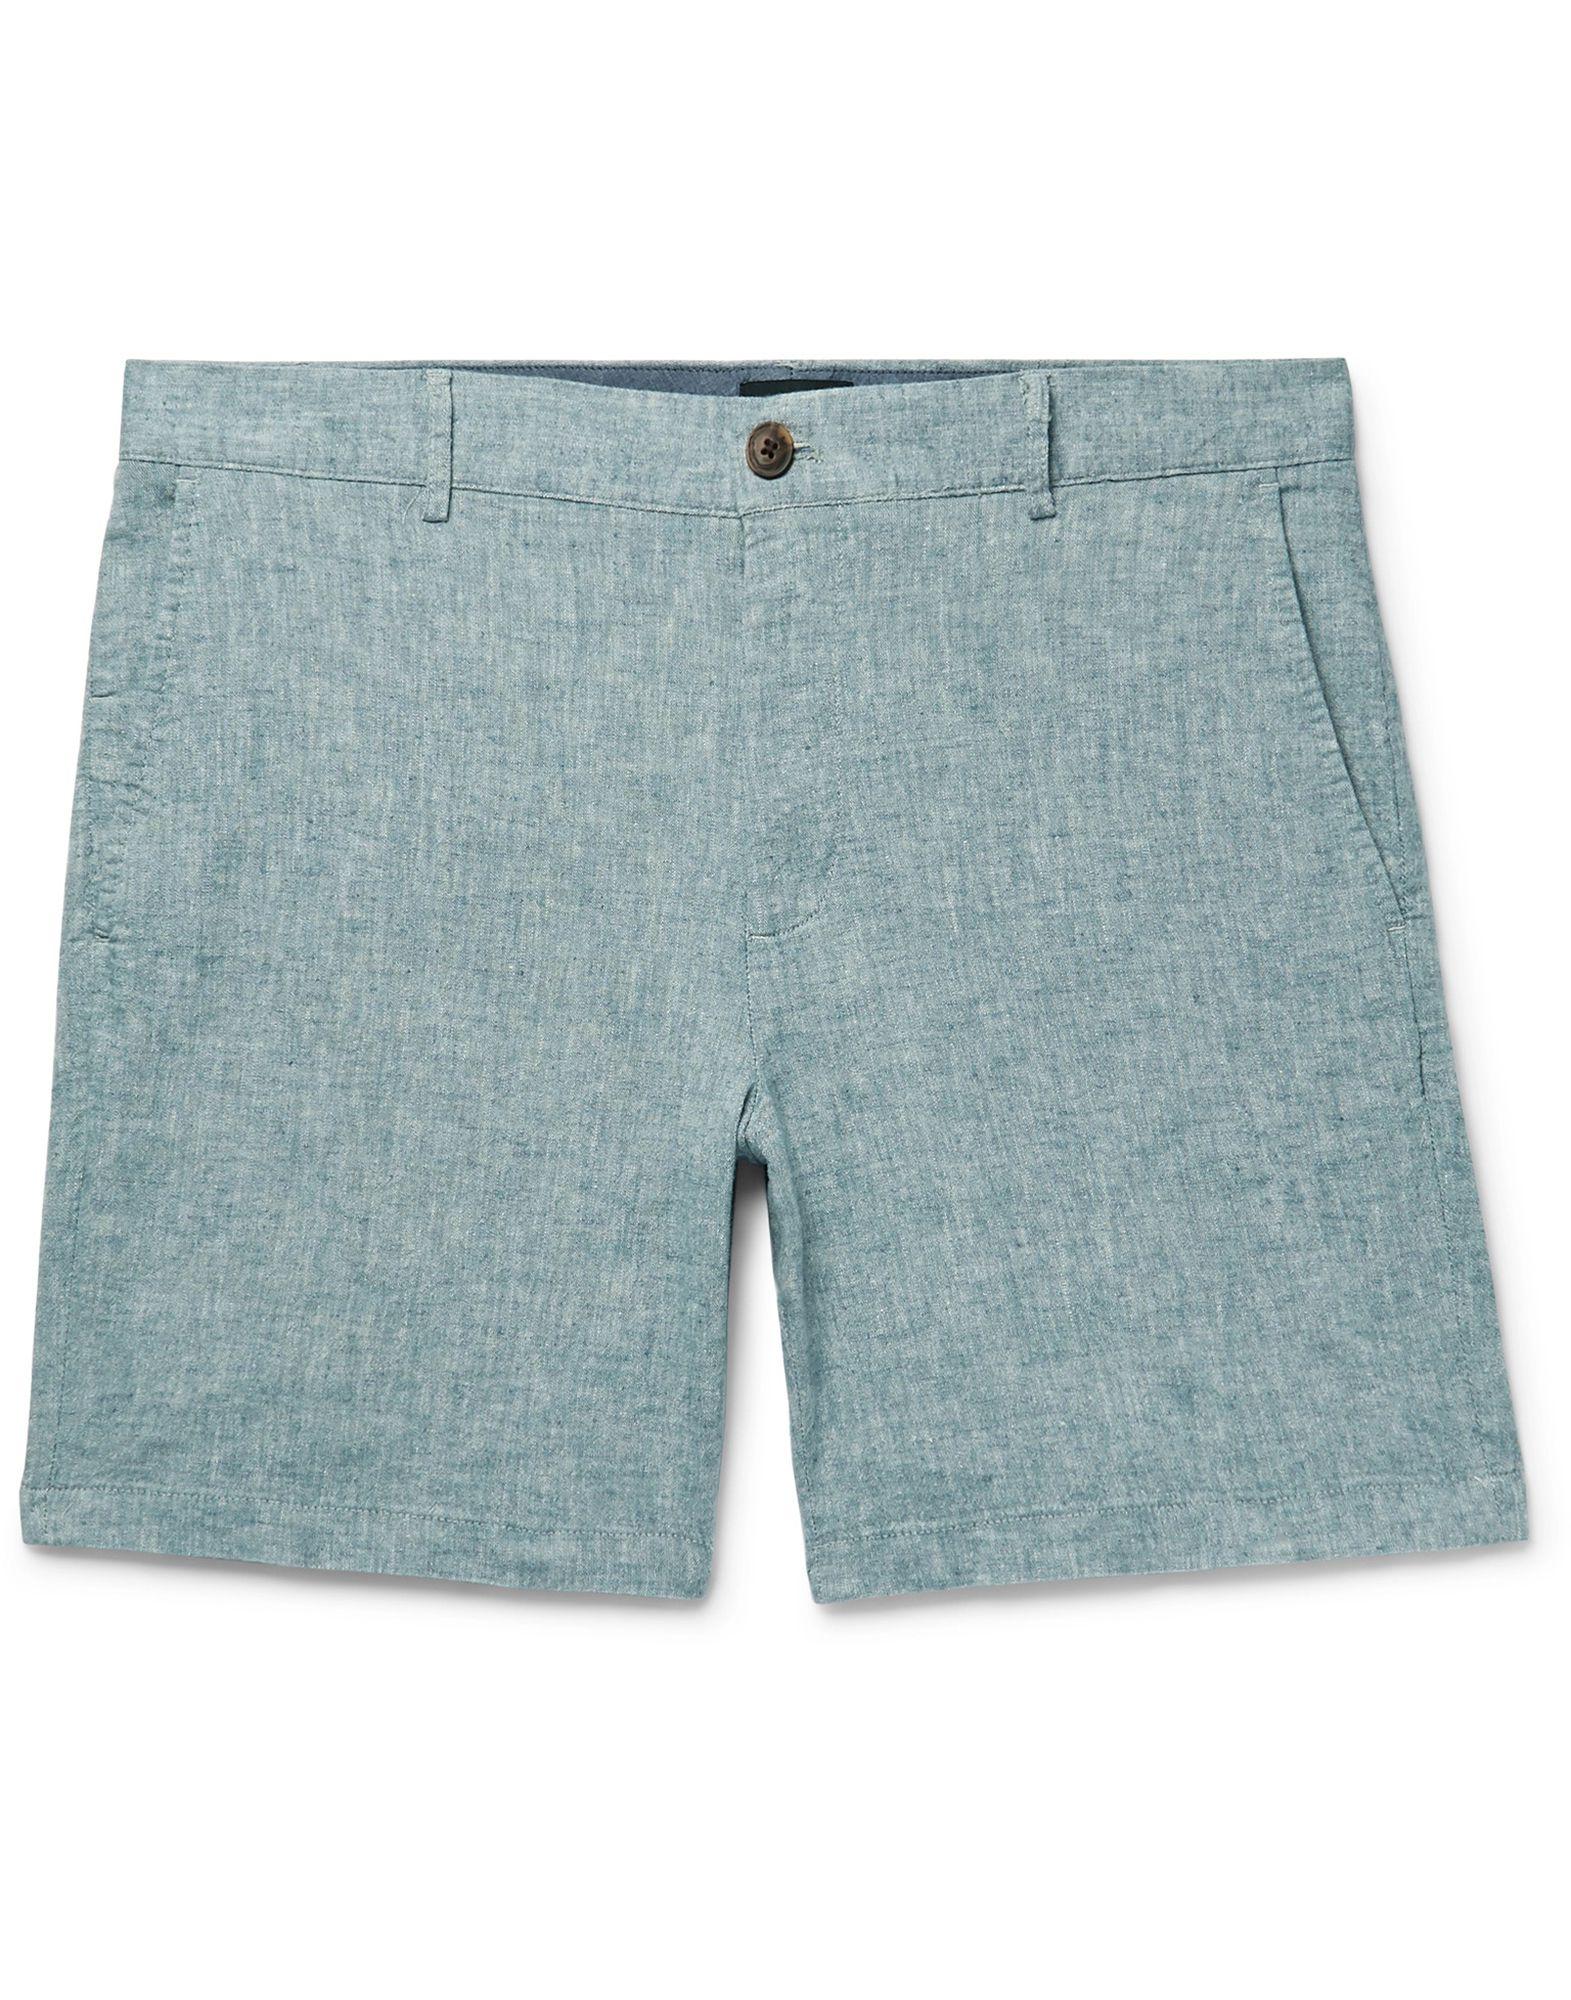 CLUB MONACO Bermudas. plain weave, two-tone, no appliqués, high waisted, button, zip, multipockets, stretch. 54% Linen, 44% Cotton, 2% Elastane